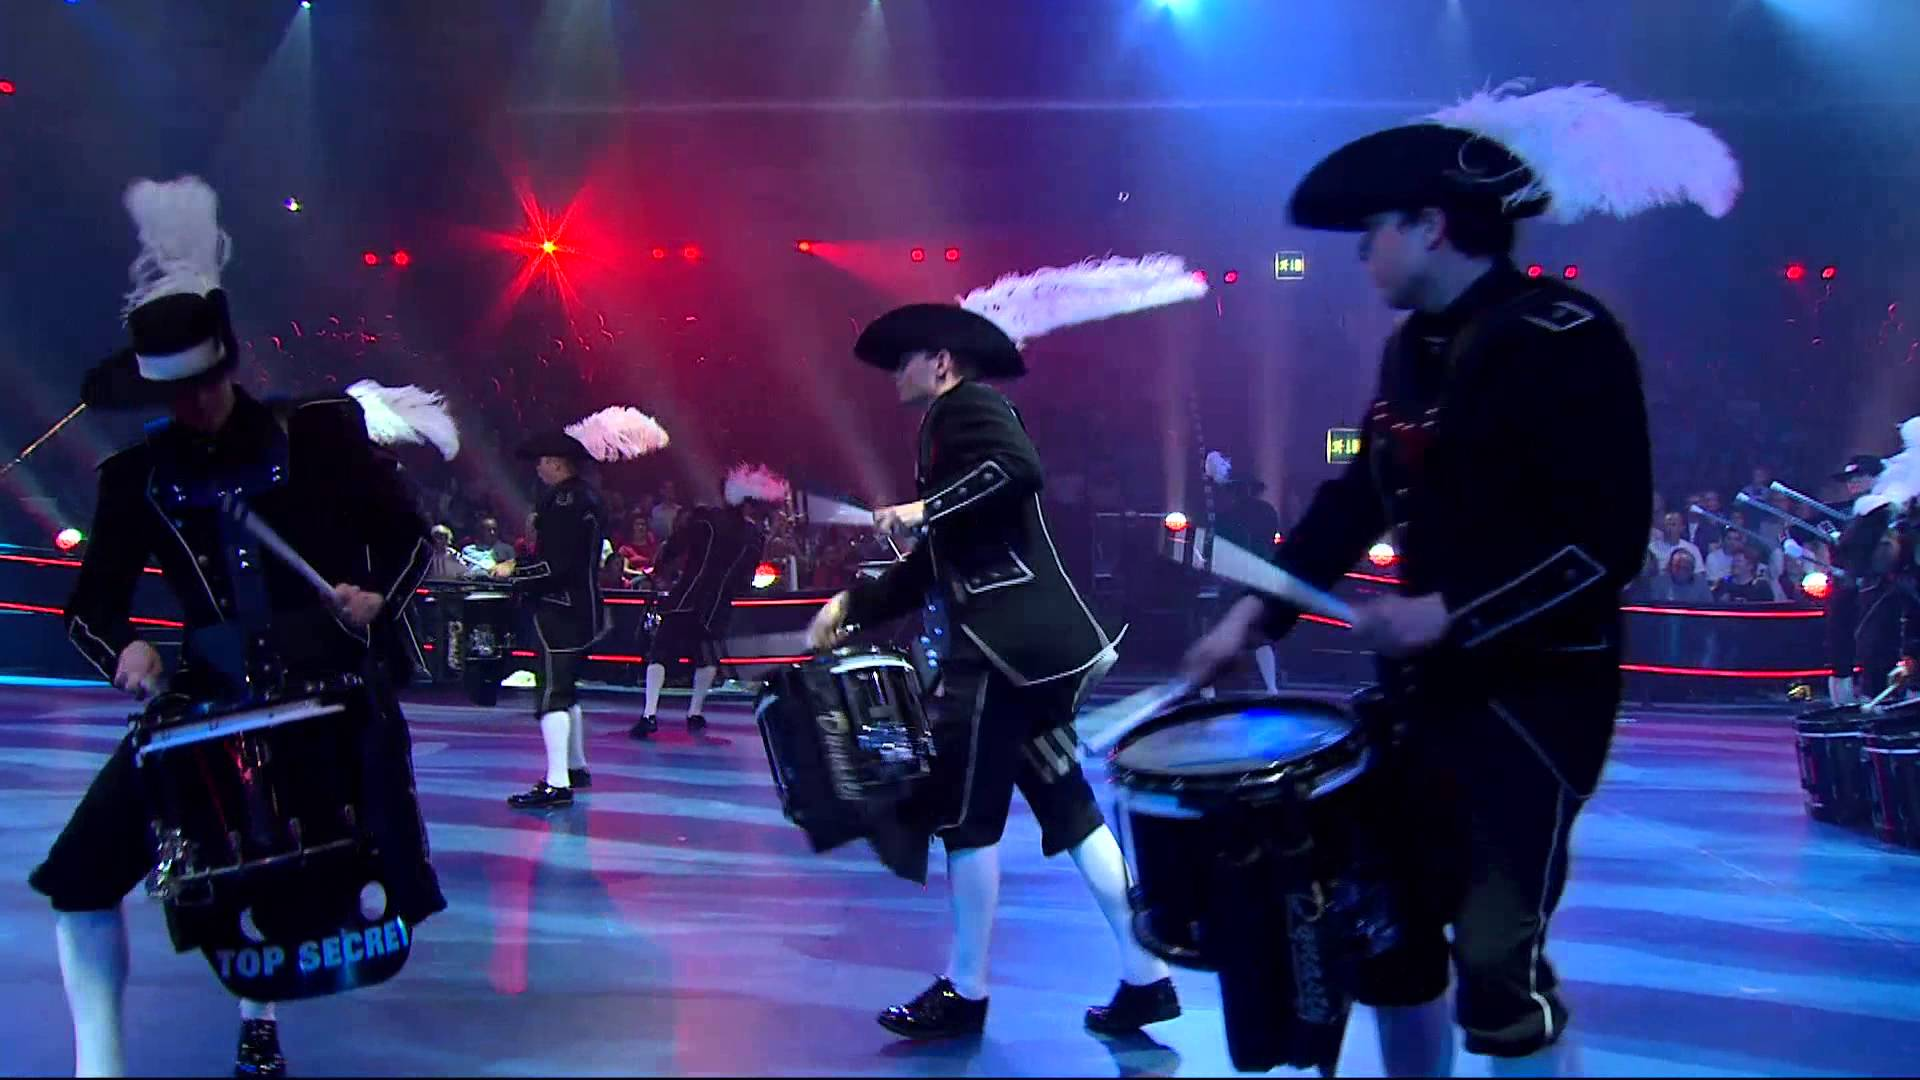 Top Secret Drum Corps 2016